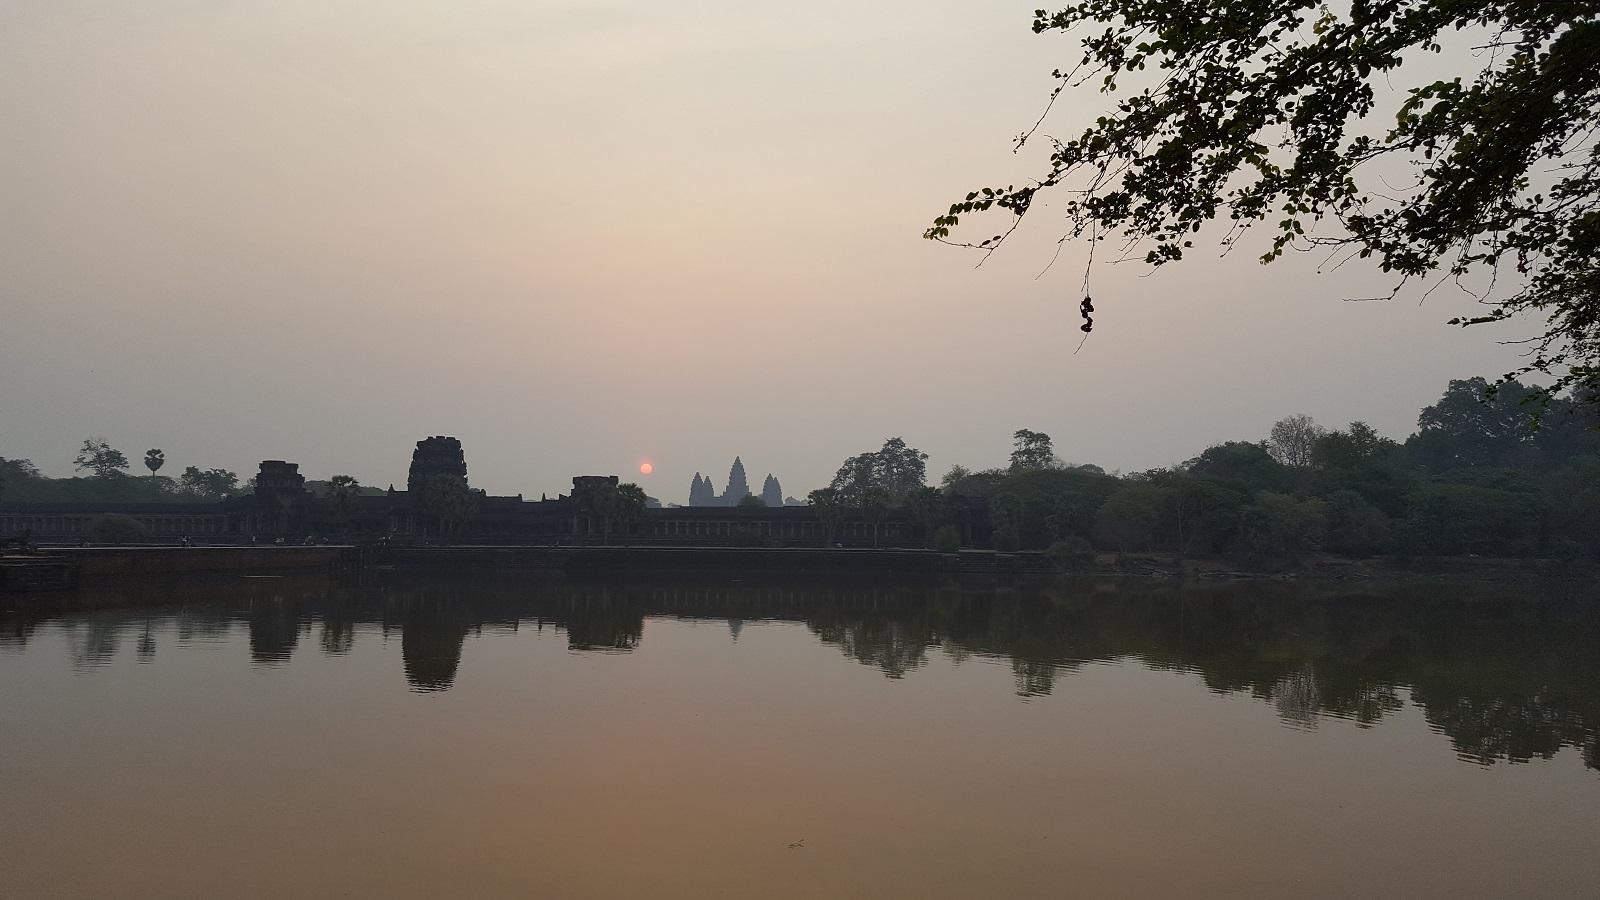 Kambodscha, Siem Reap | Angkor Wat